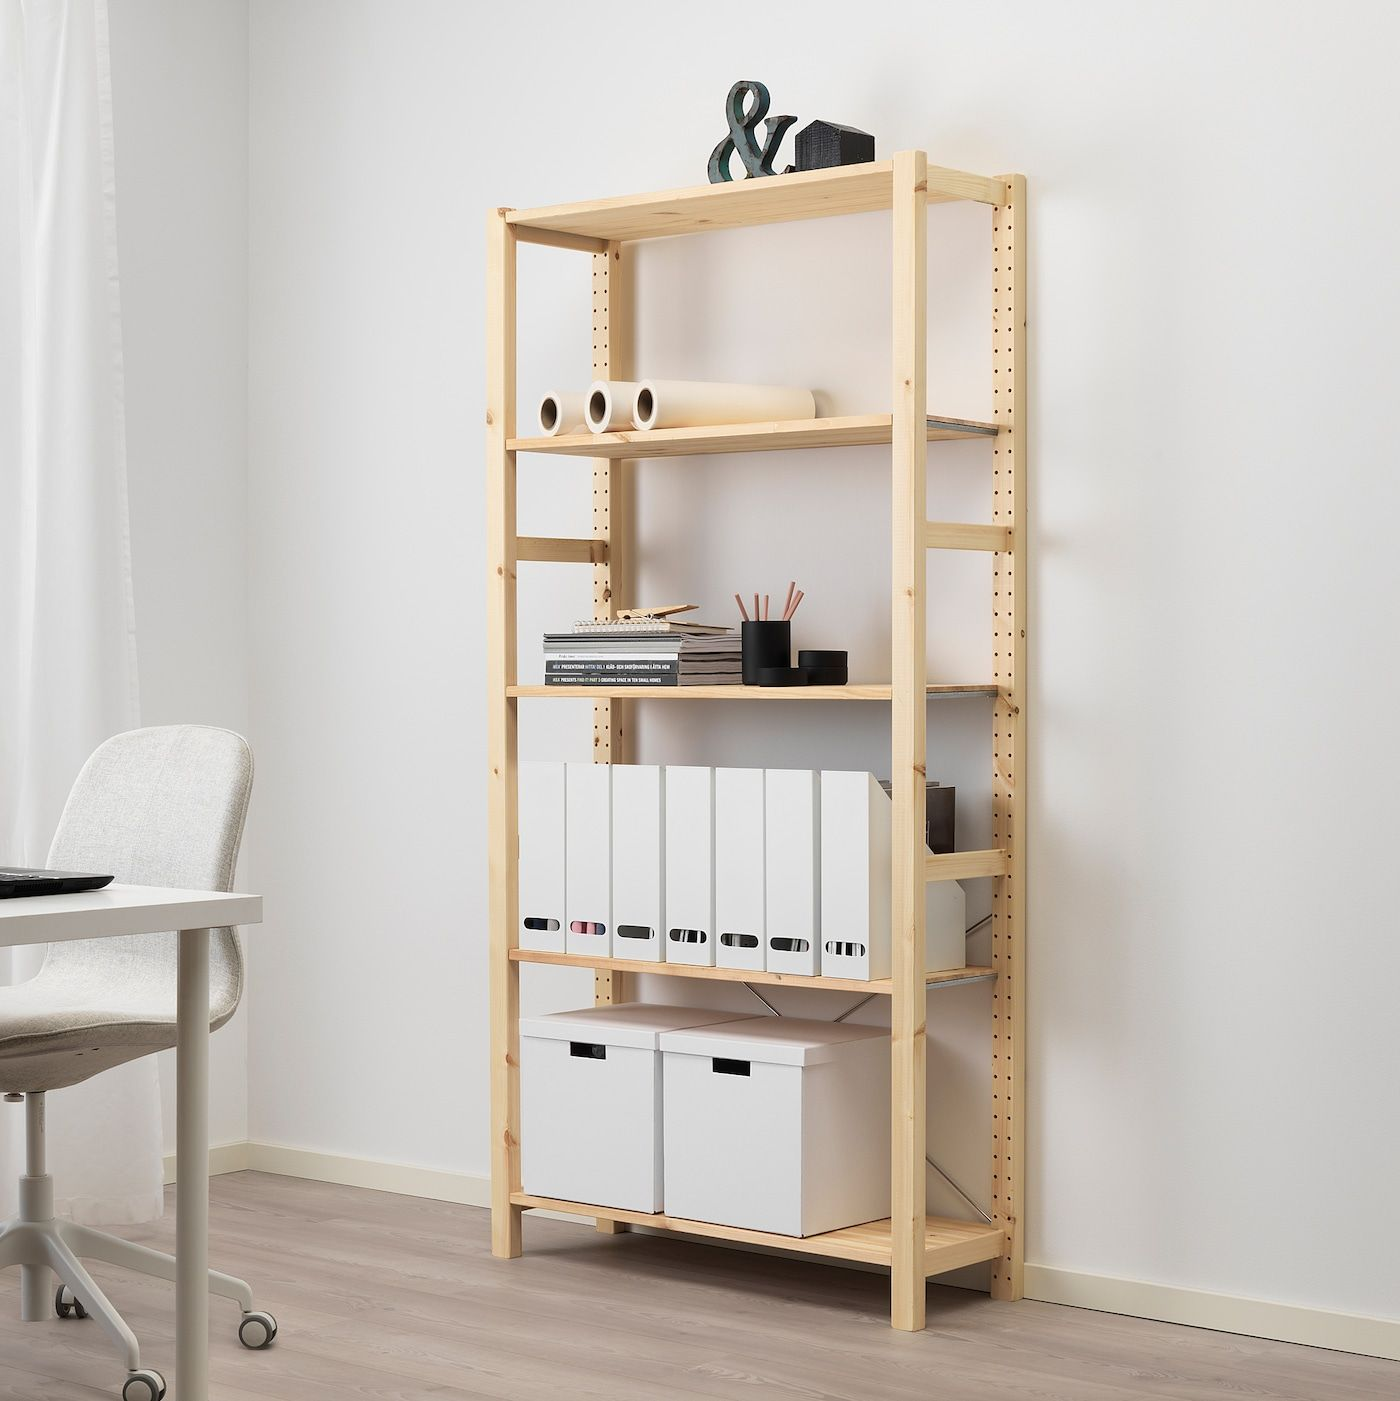 Ikea Scaffali Legno Ivar ivar scaffale - pino 89x30x179 cm nel 2020 | idee scaffale